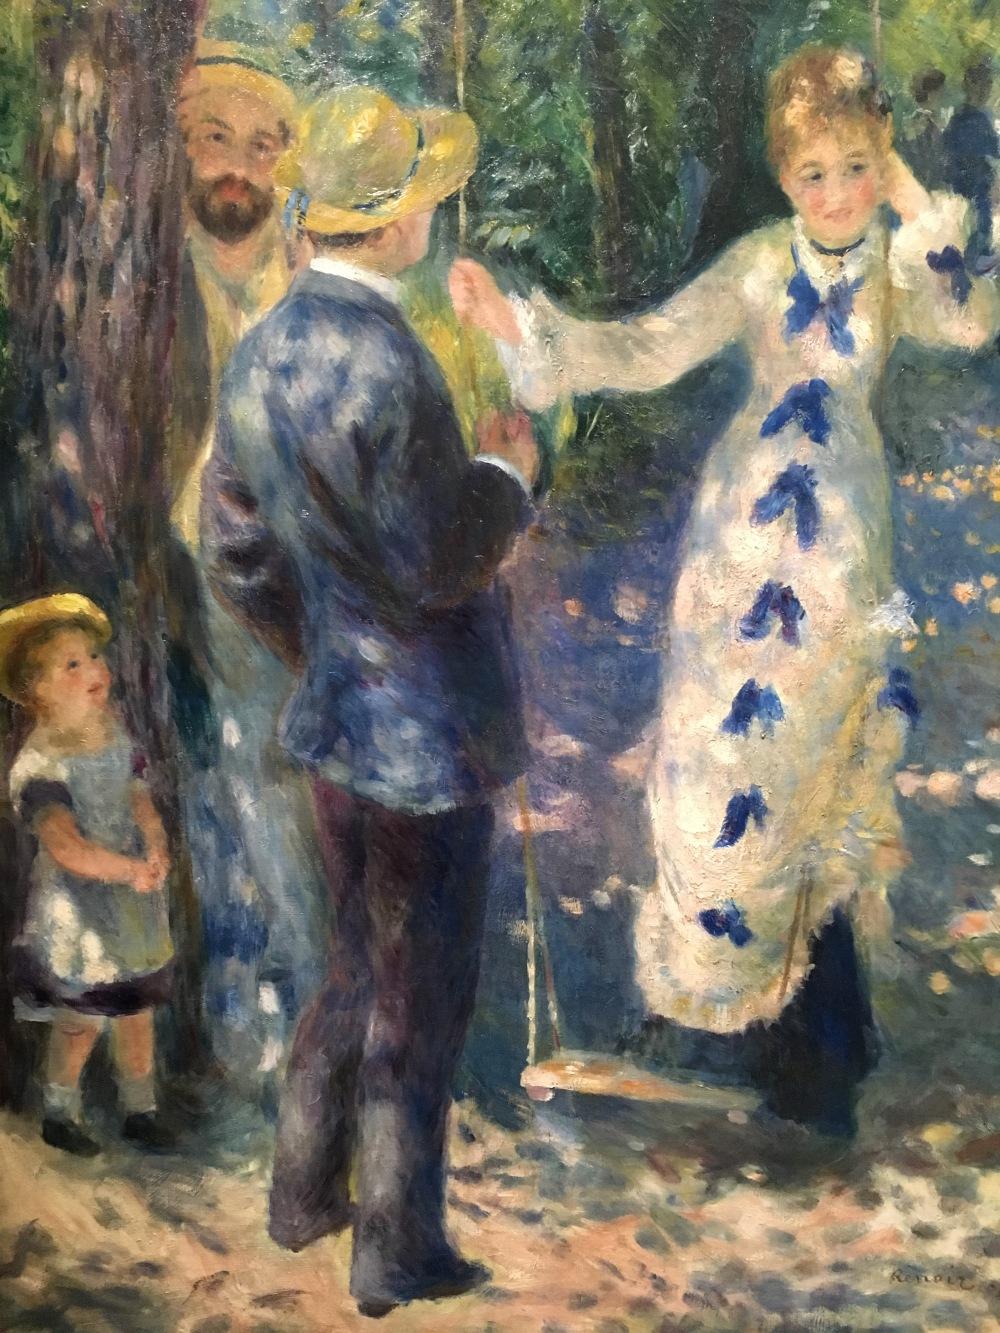 renoir-painting-the-swing-painted-in-gardens-at-12-rue-cortot